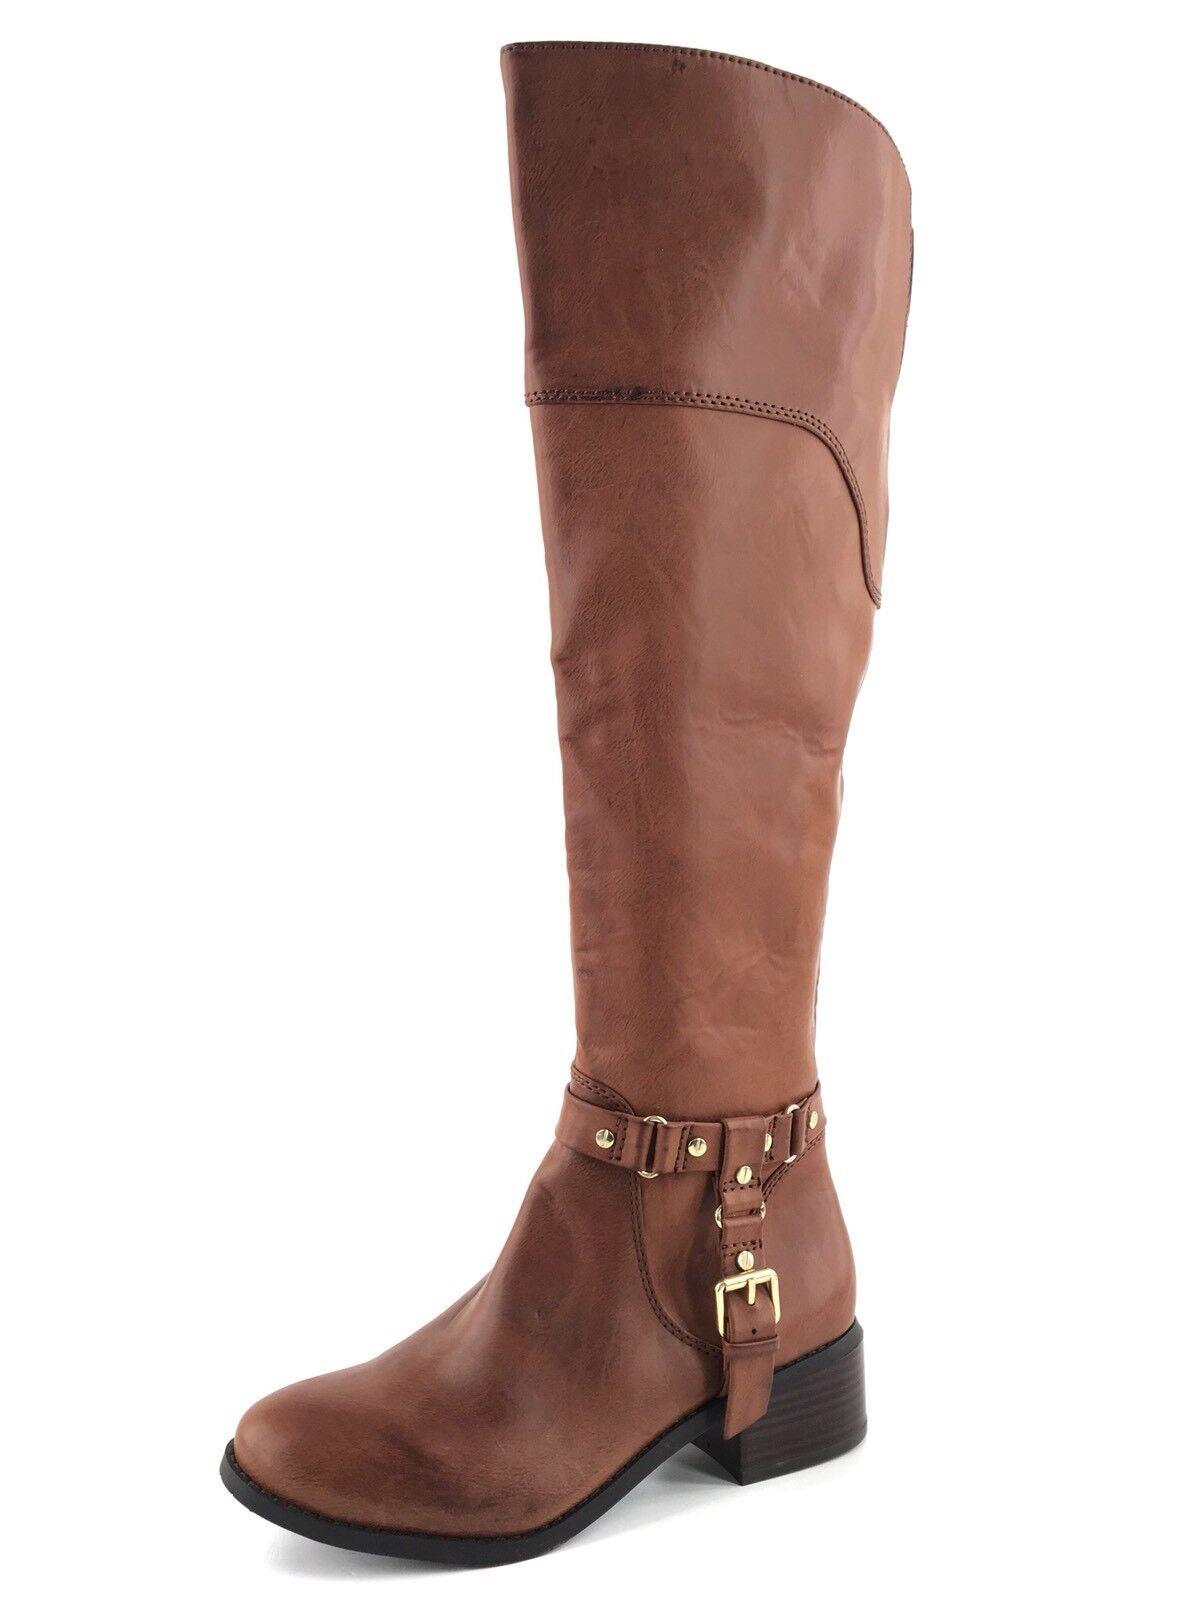 Dolce Vita Coup Cognac Leder Over The Knee Riding Stiefel Damens's Größe 7 M